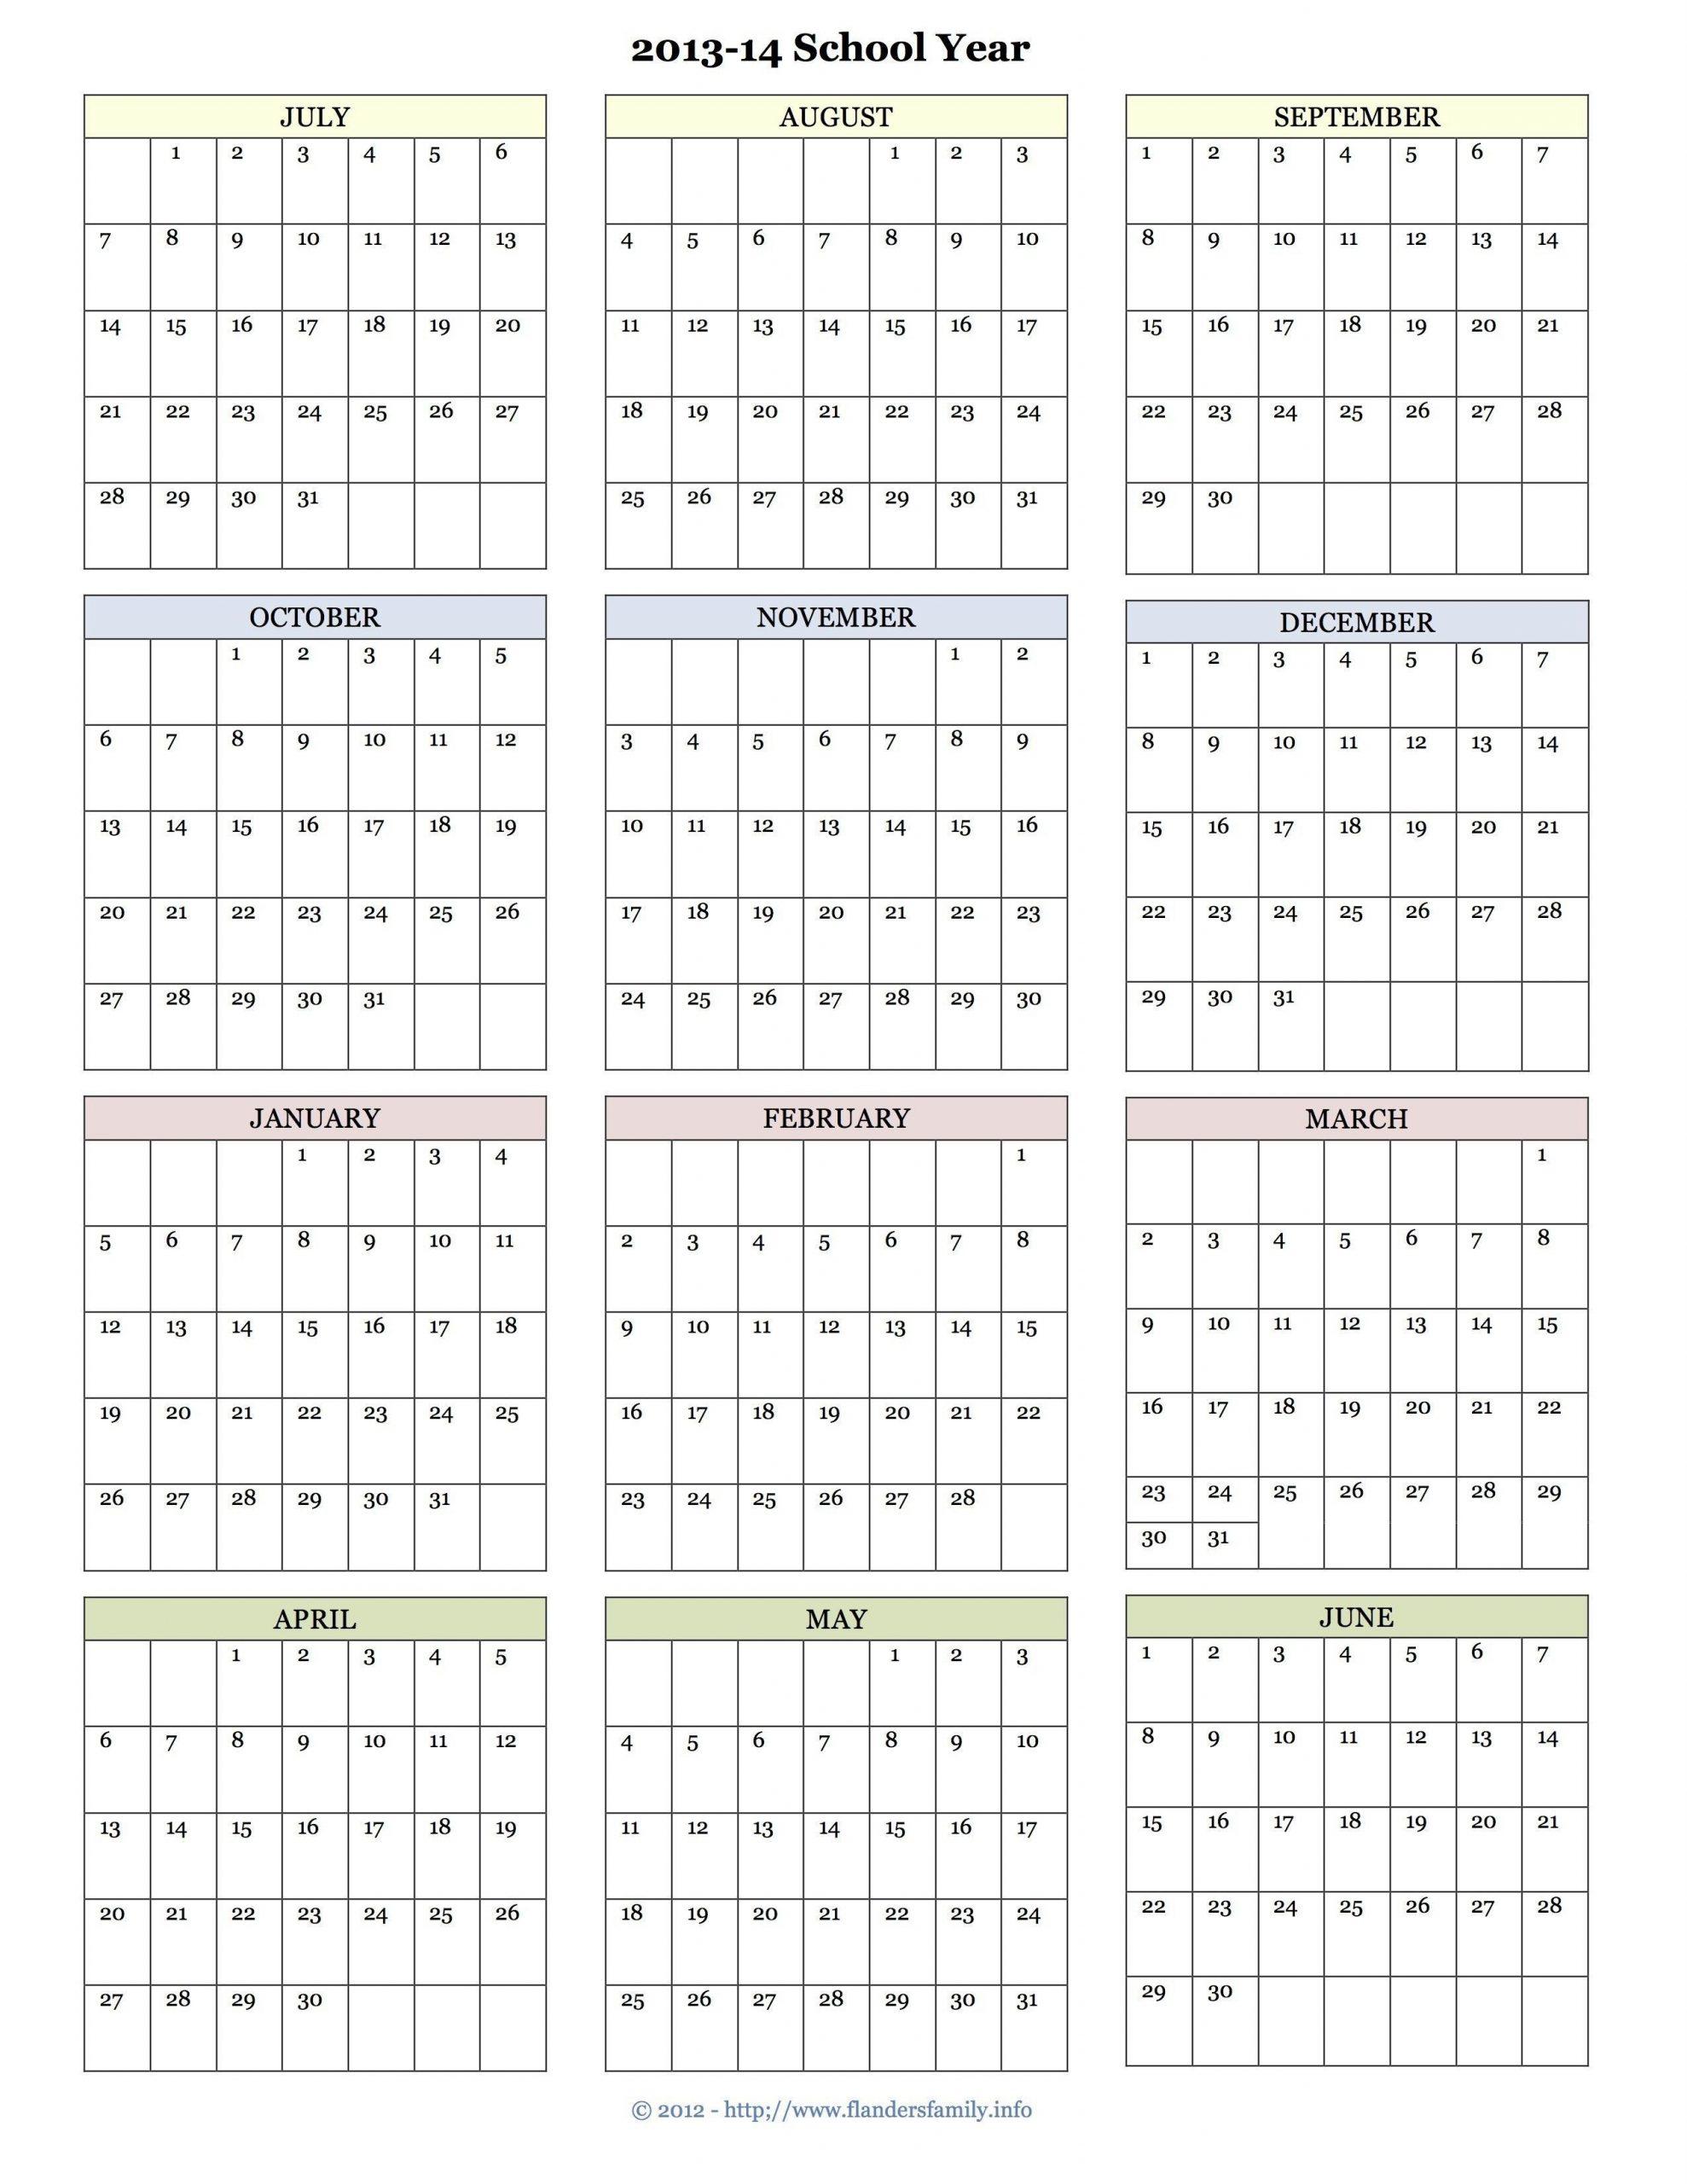 Printable Academic Calendar The Flanders Family Website